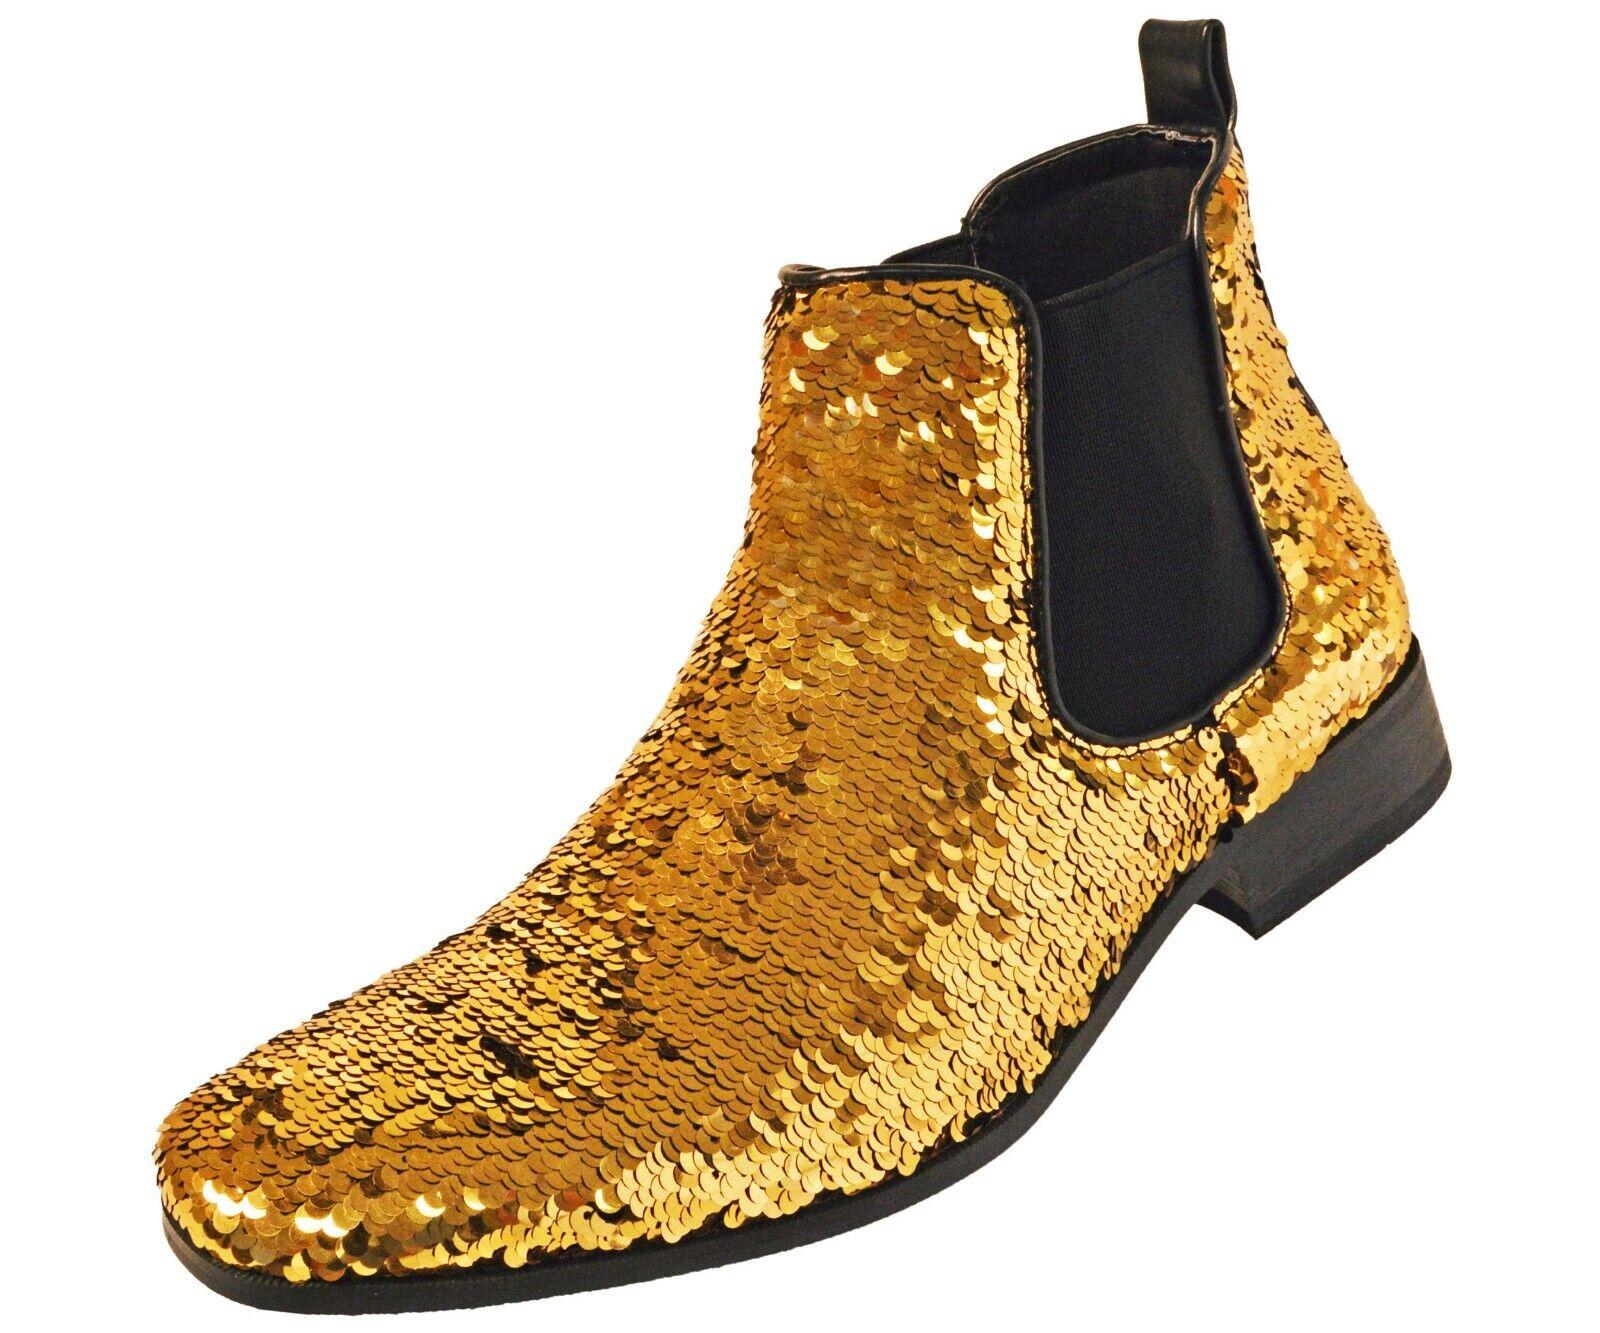 Amali Men's Reversible Metallic Sequins Chelsea Boot - Style Capri